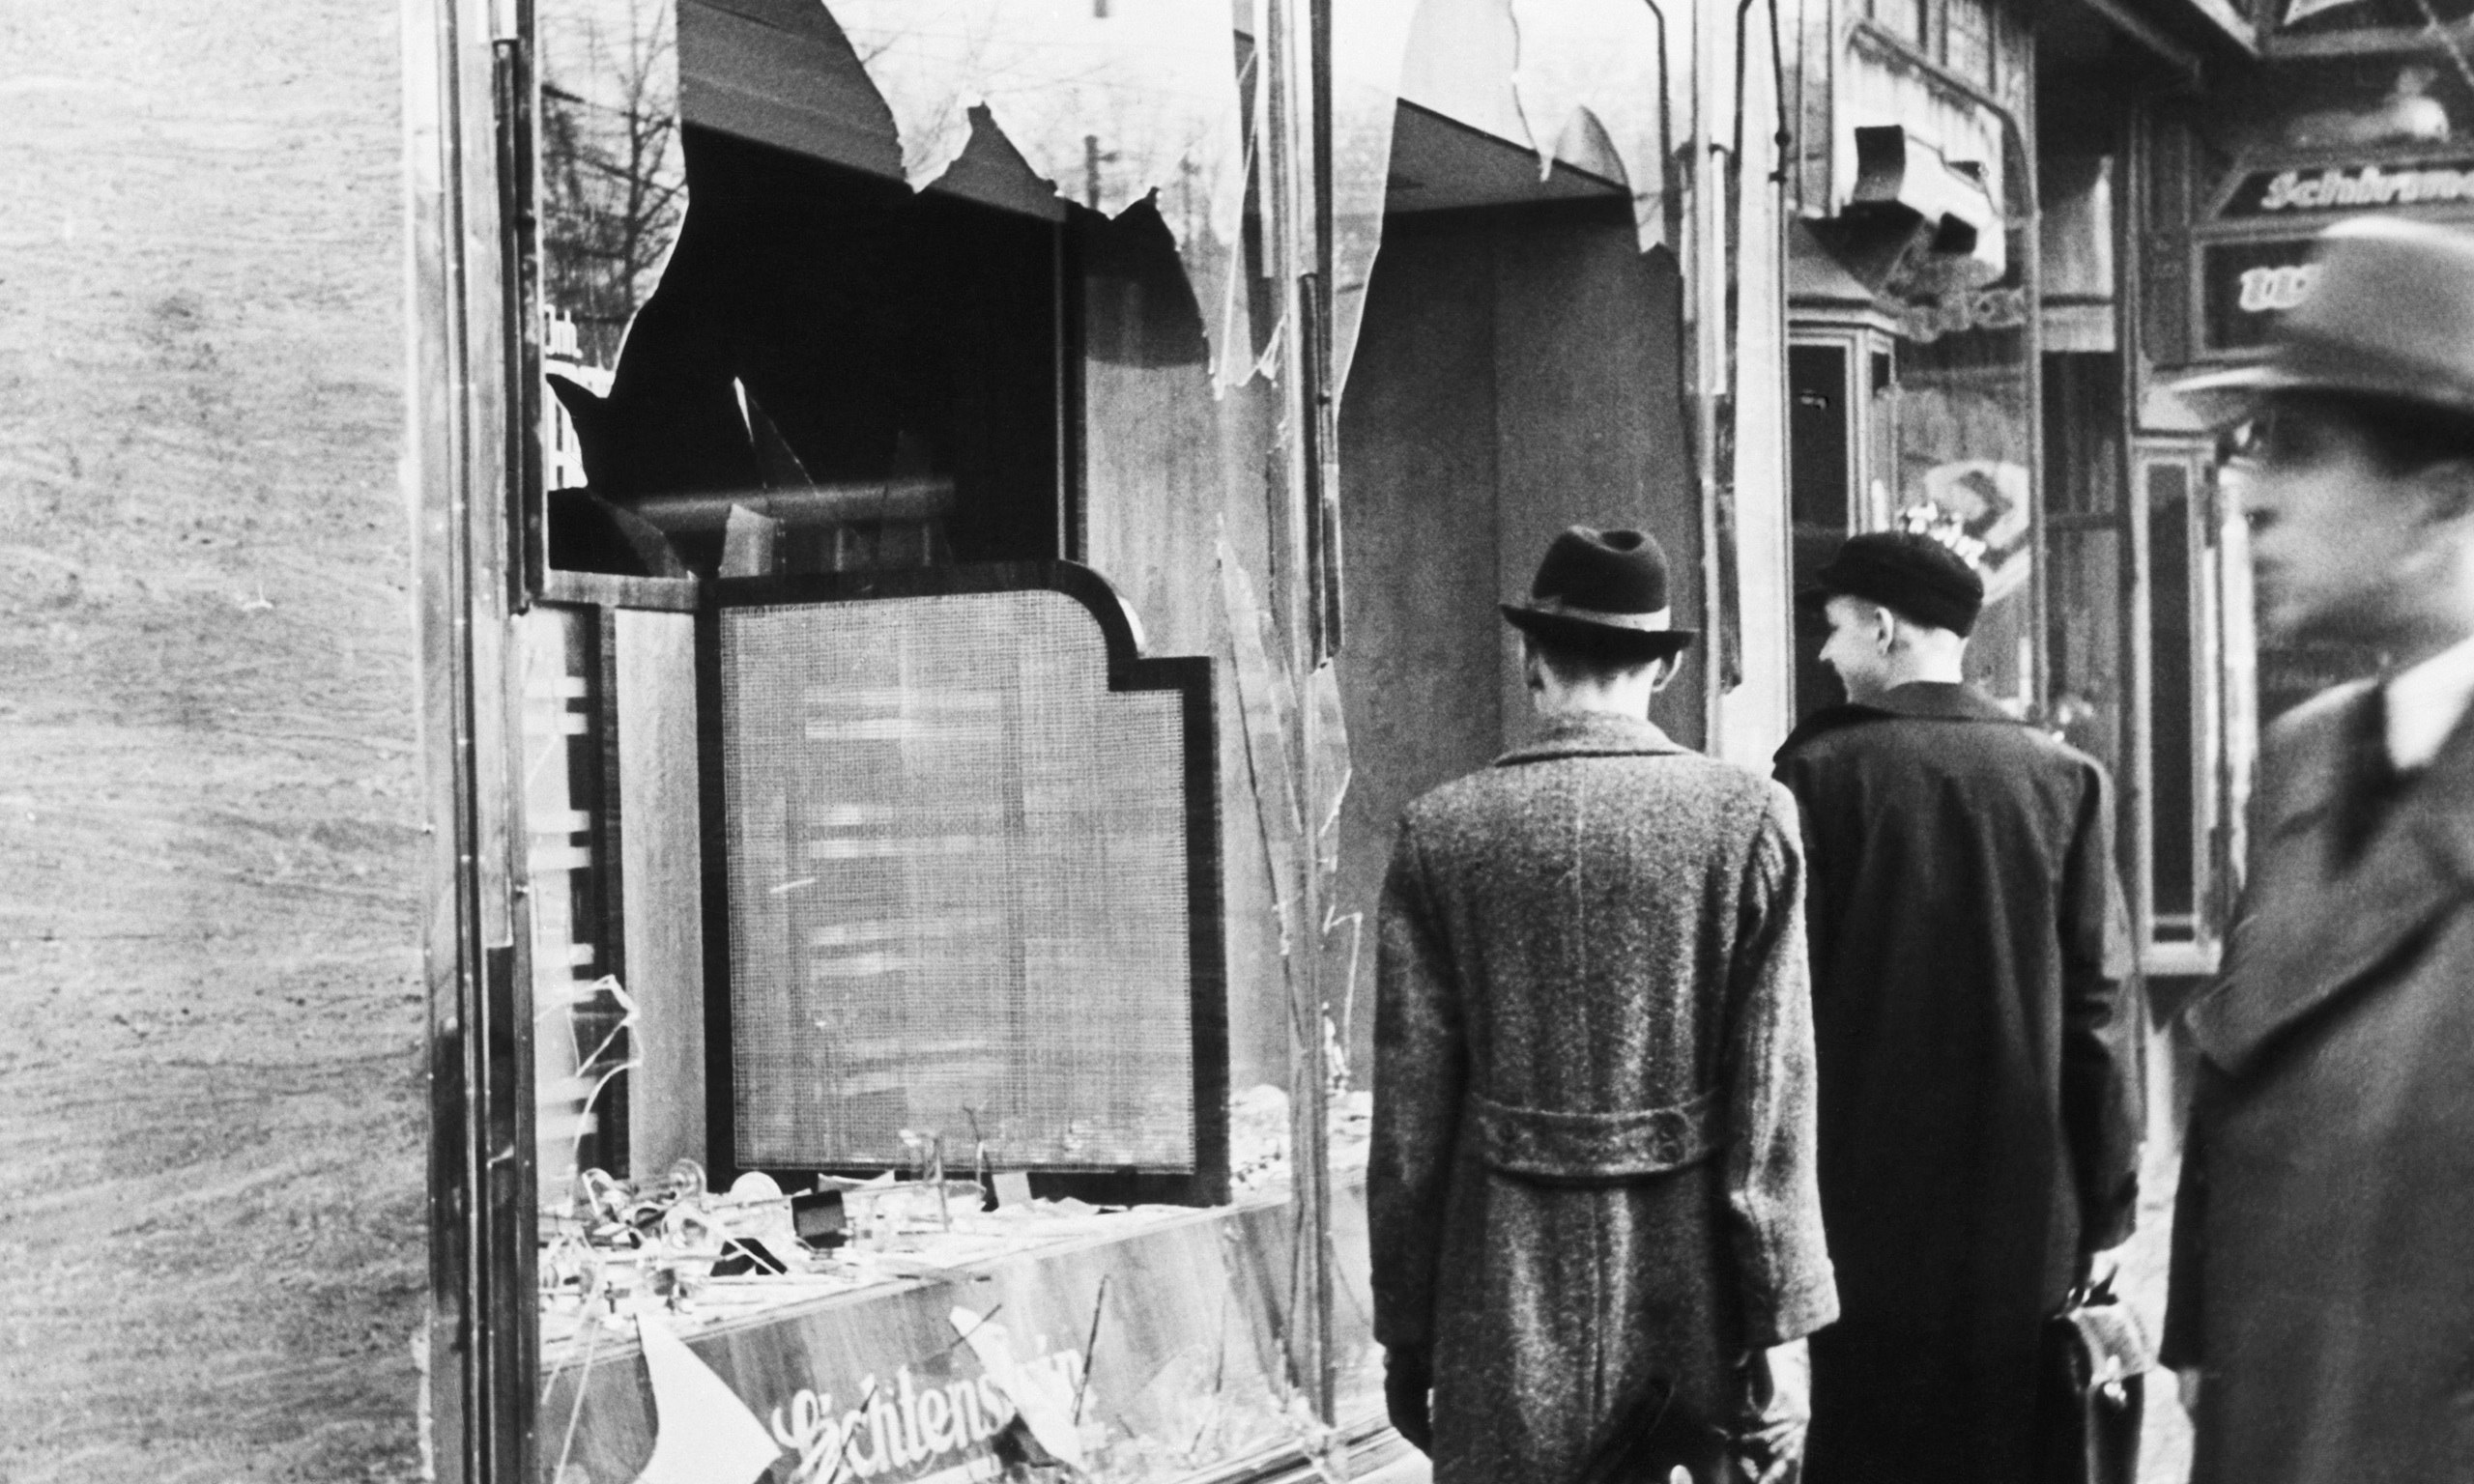 History of antisemitism